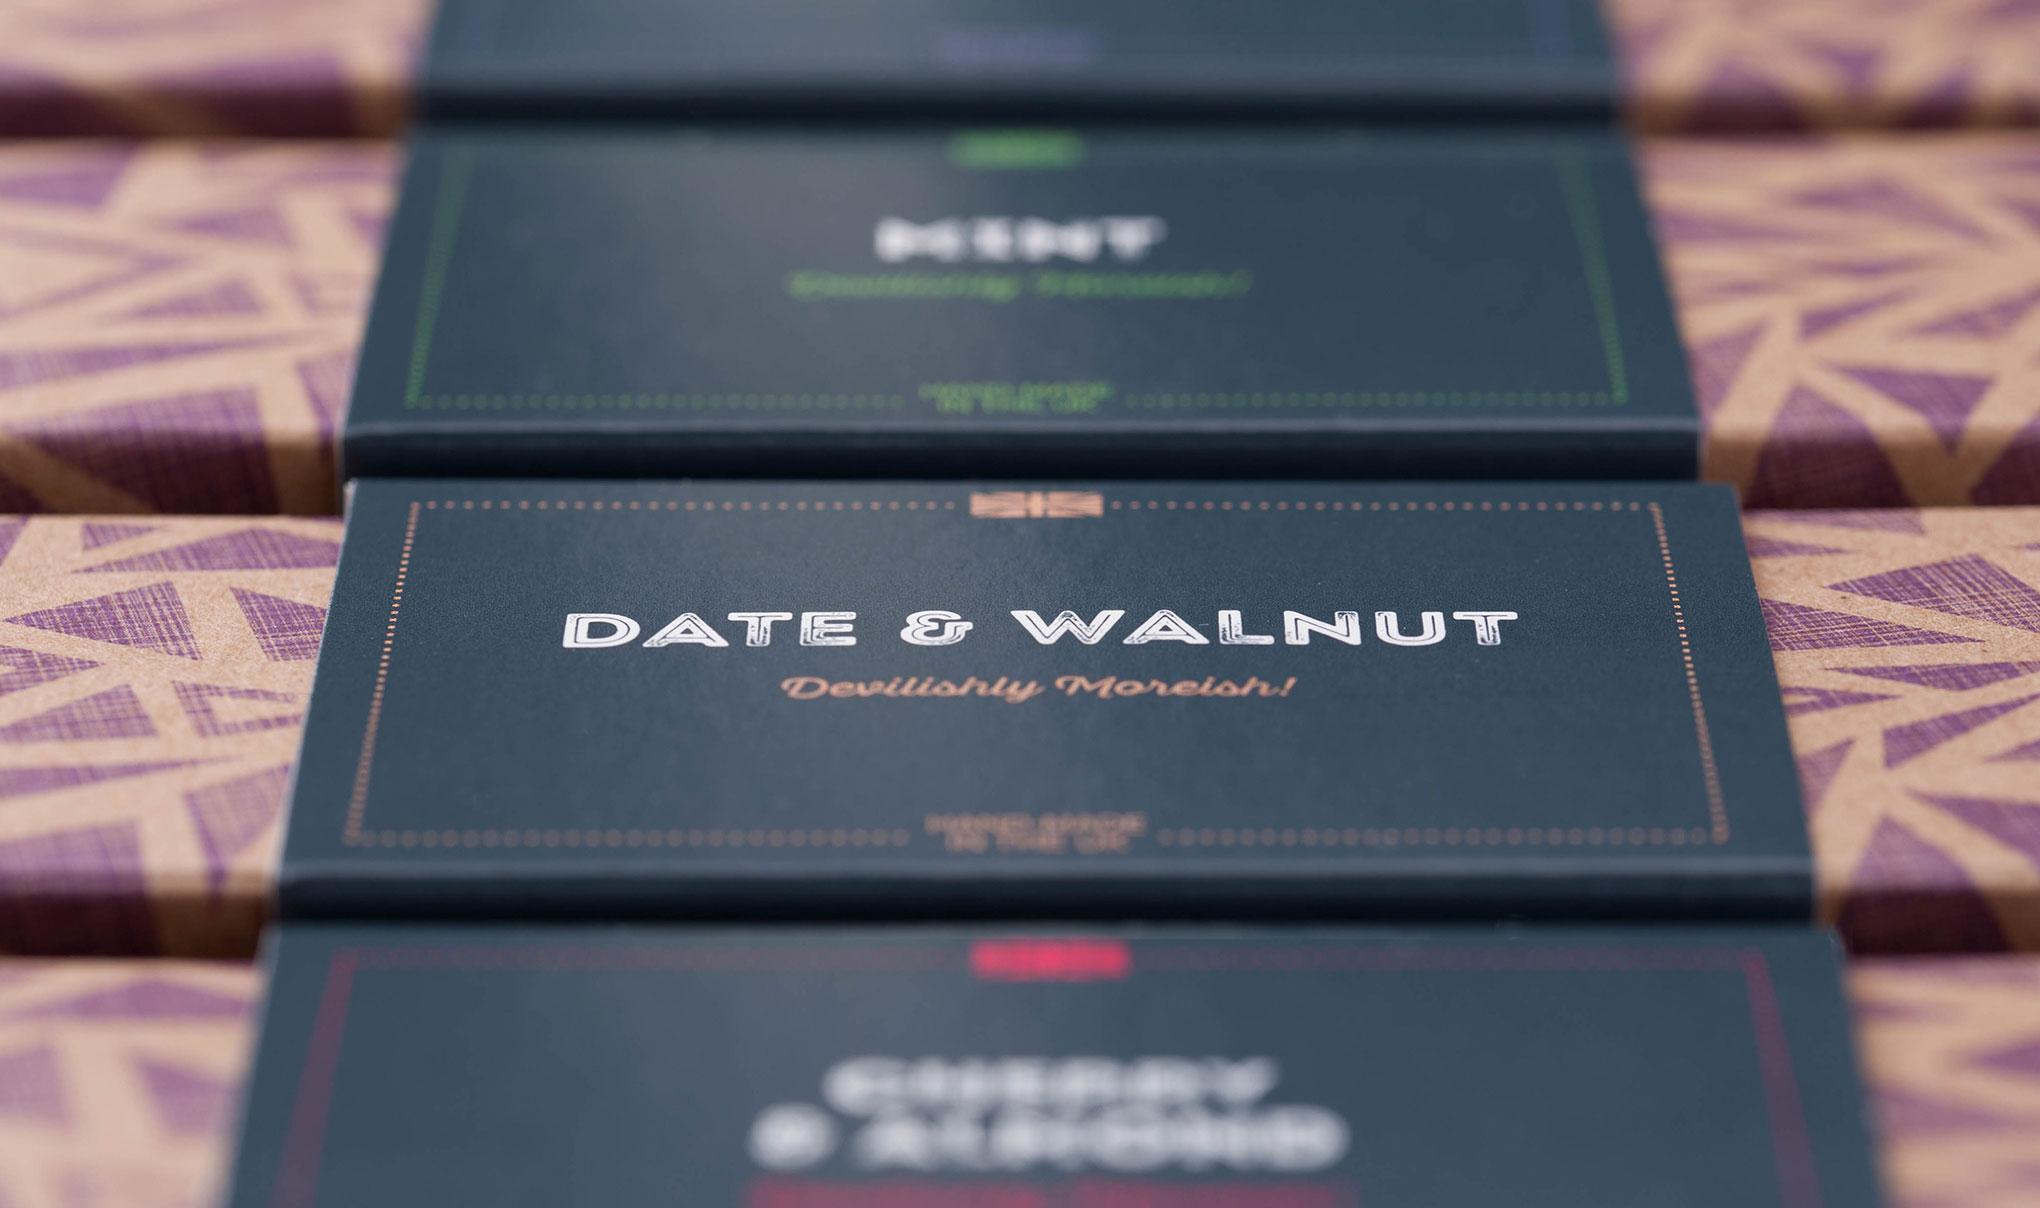 Chocolate packaging sleeve design. Designed by food packaging design agency - Flipflop Design.